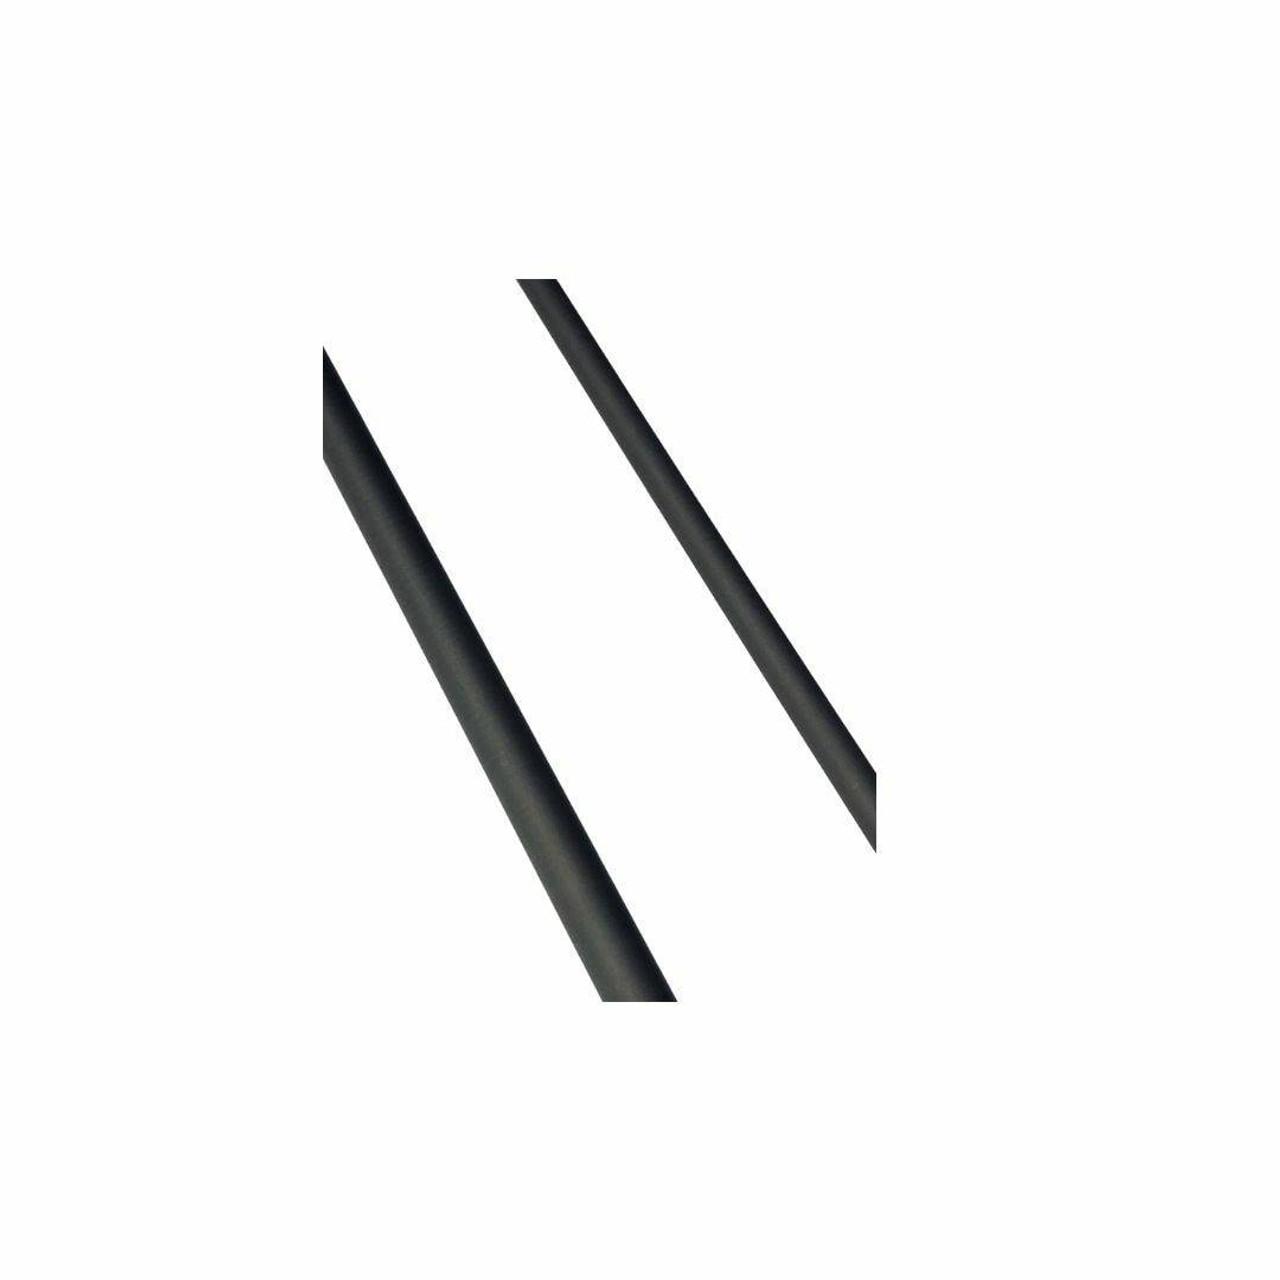 Nymph 10ft 4pc 2wt,2 tips,IM6 slim blank,medium fast action Black River Fly Rod